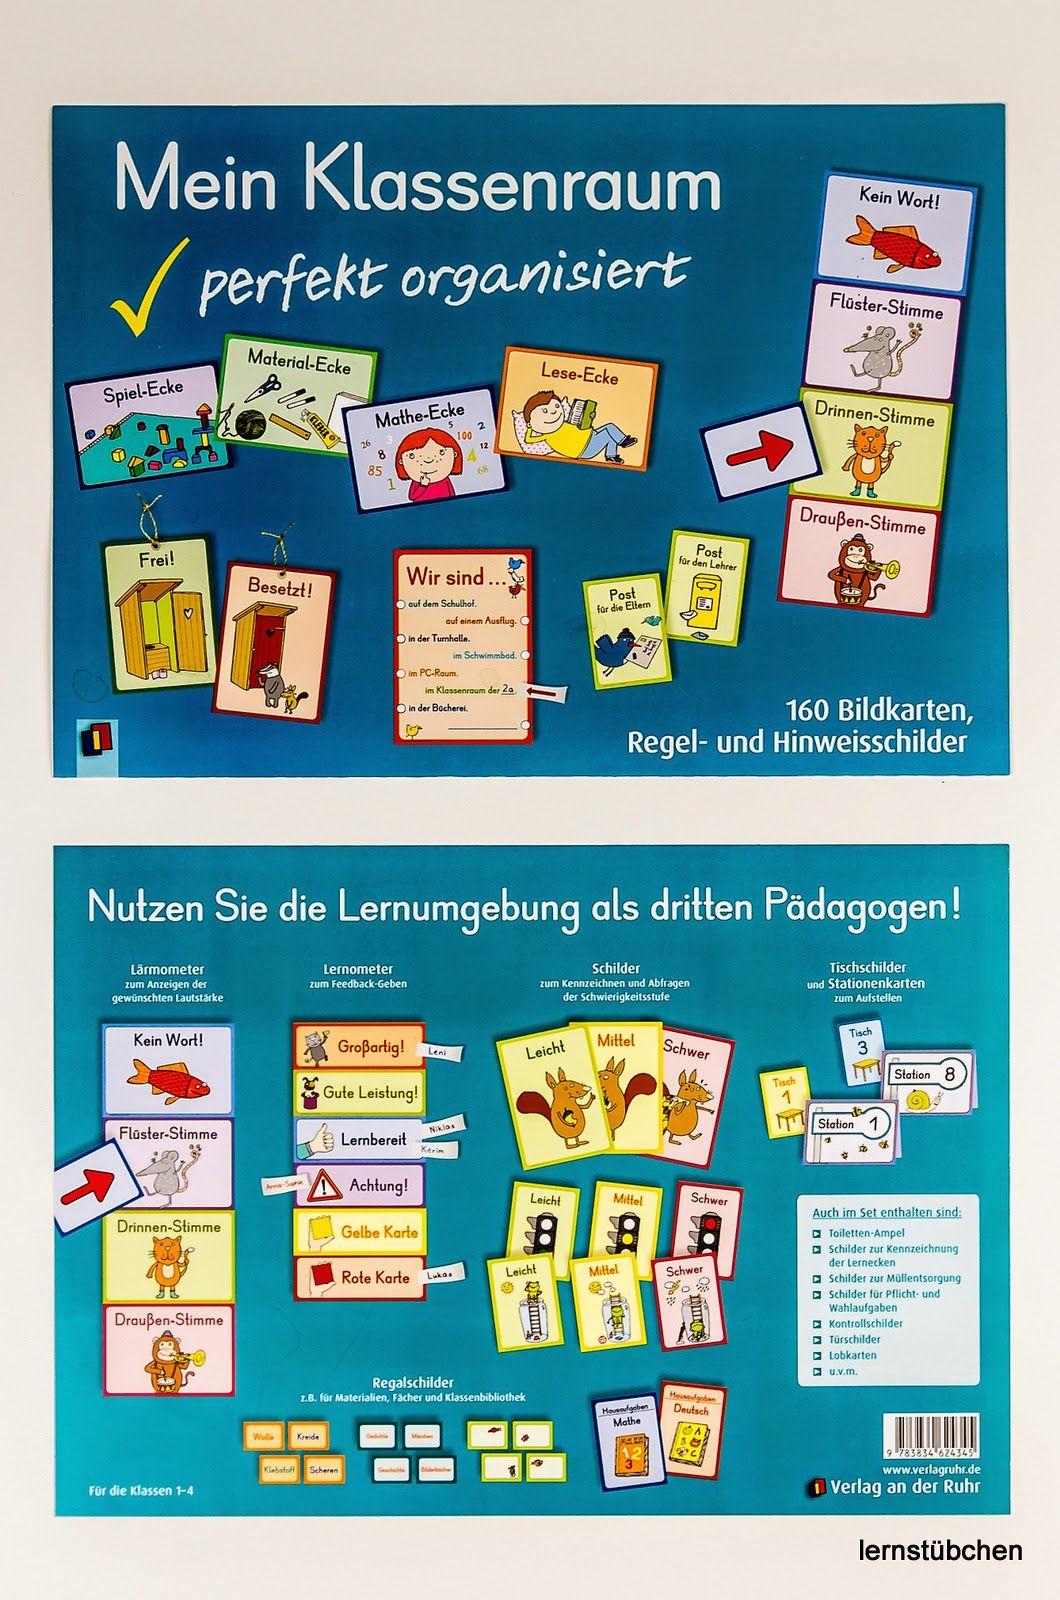 Klassenregeln grundschule bildkarten  Lernstübchen: Mein Klassenraum perfekt organisiert | learning for ...